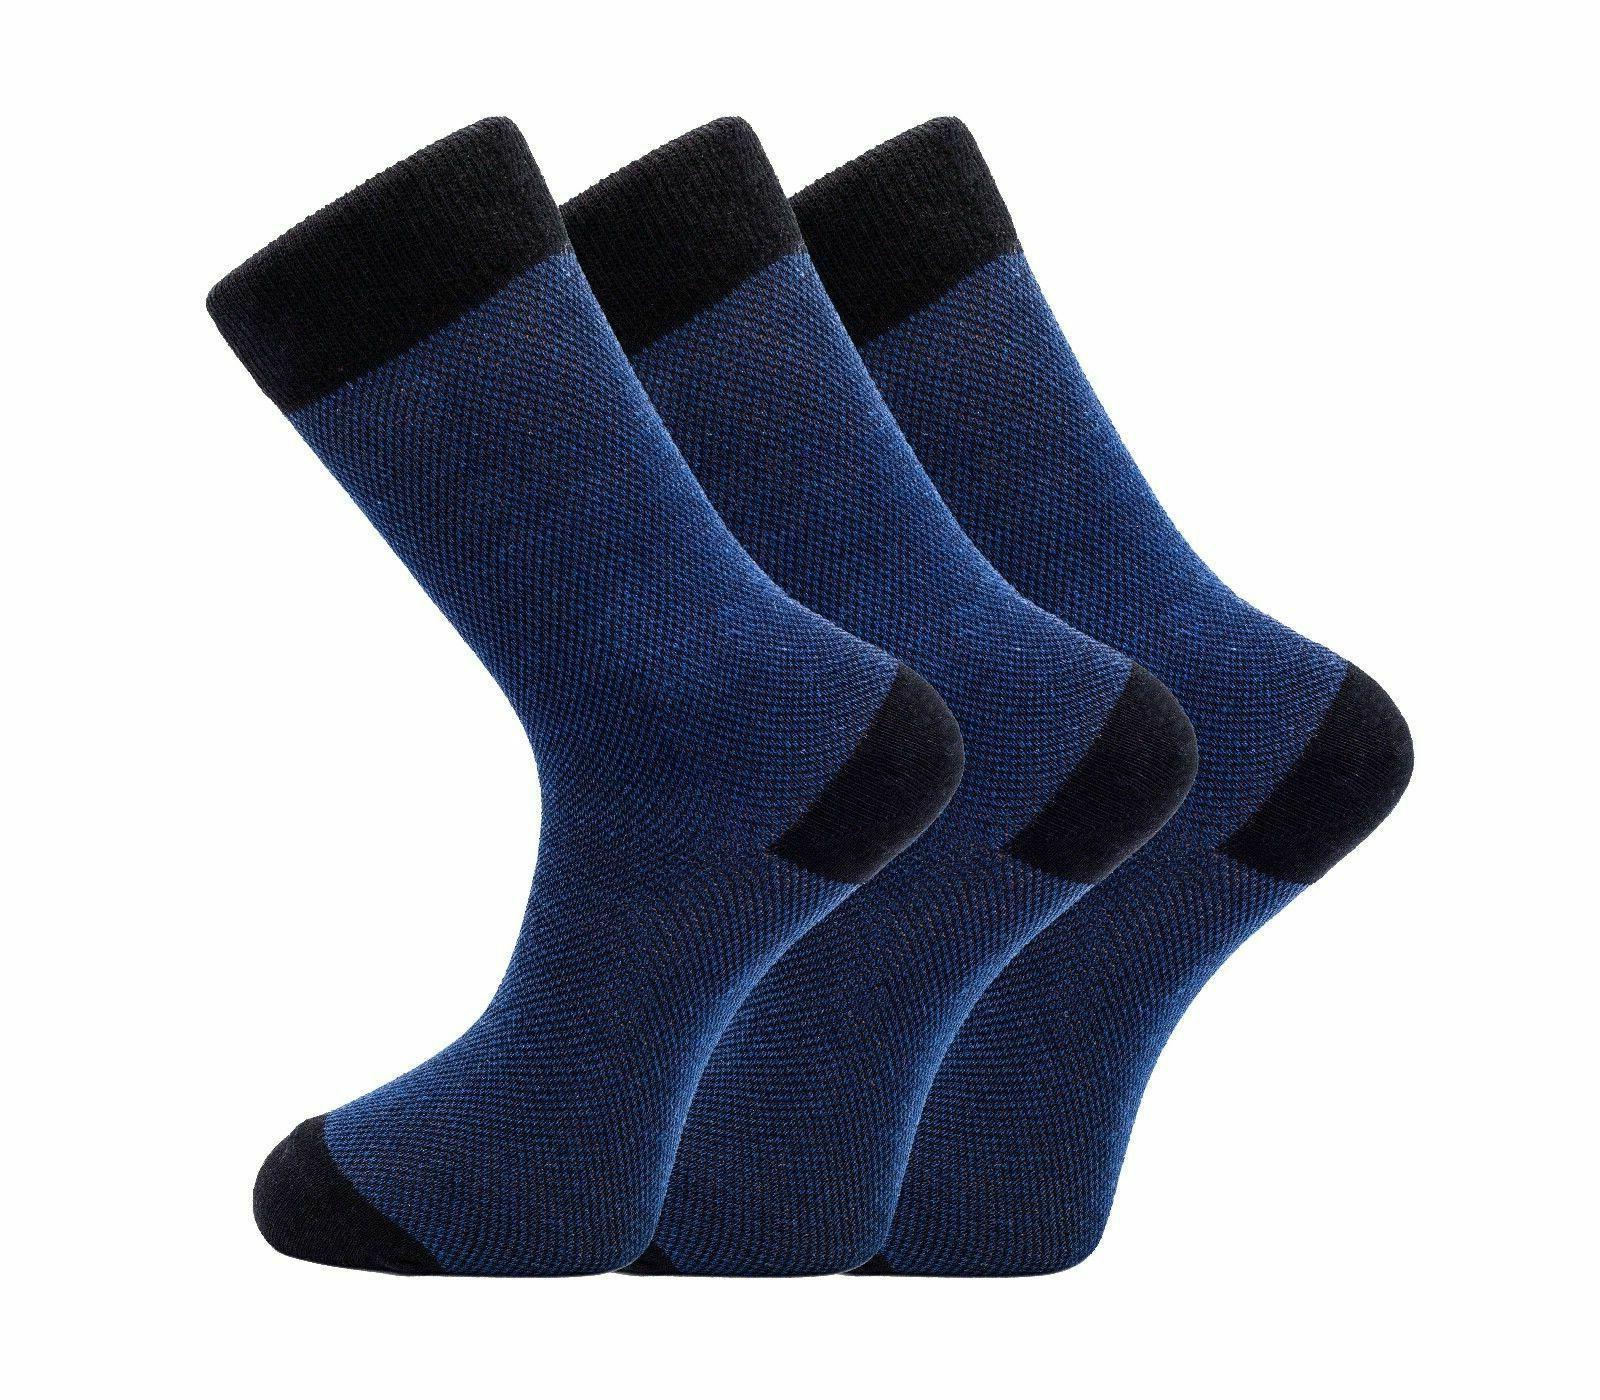 1SOCK2SOCK Mens Cotton Dress Socks Casual Blue Crew Size Lar